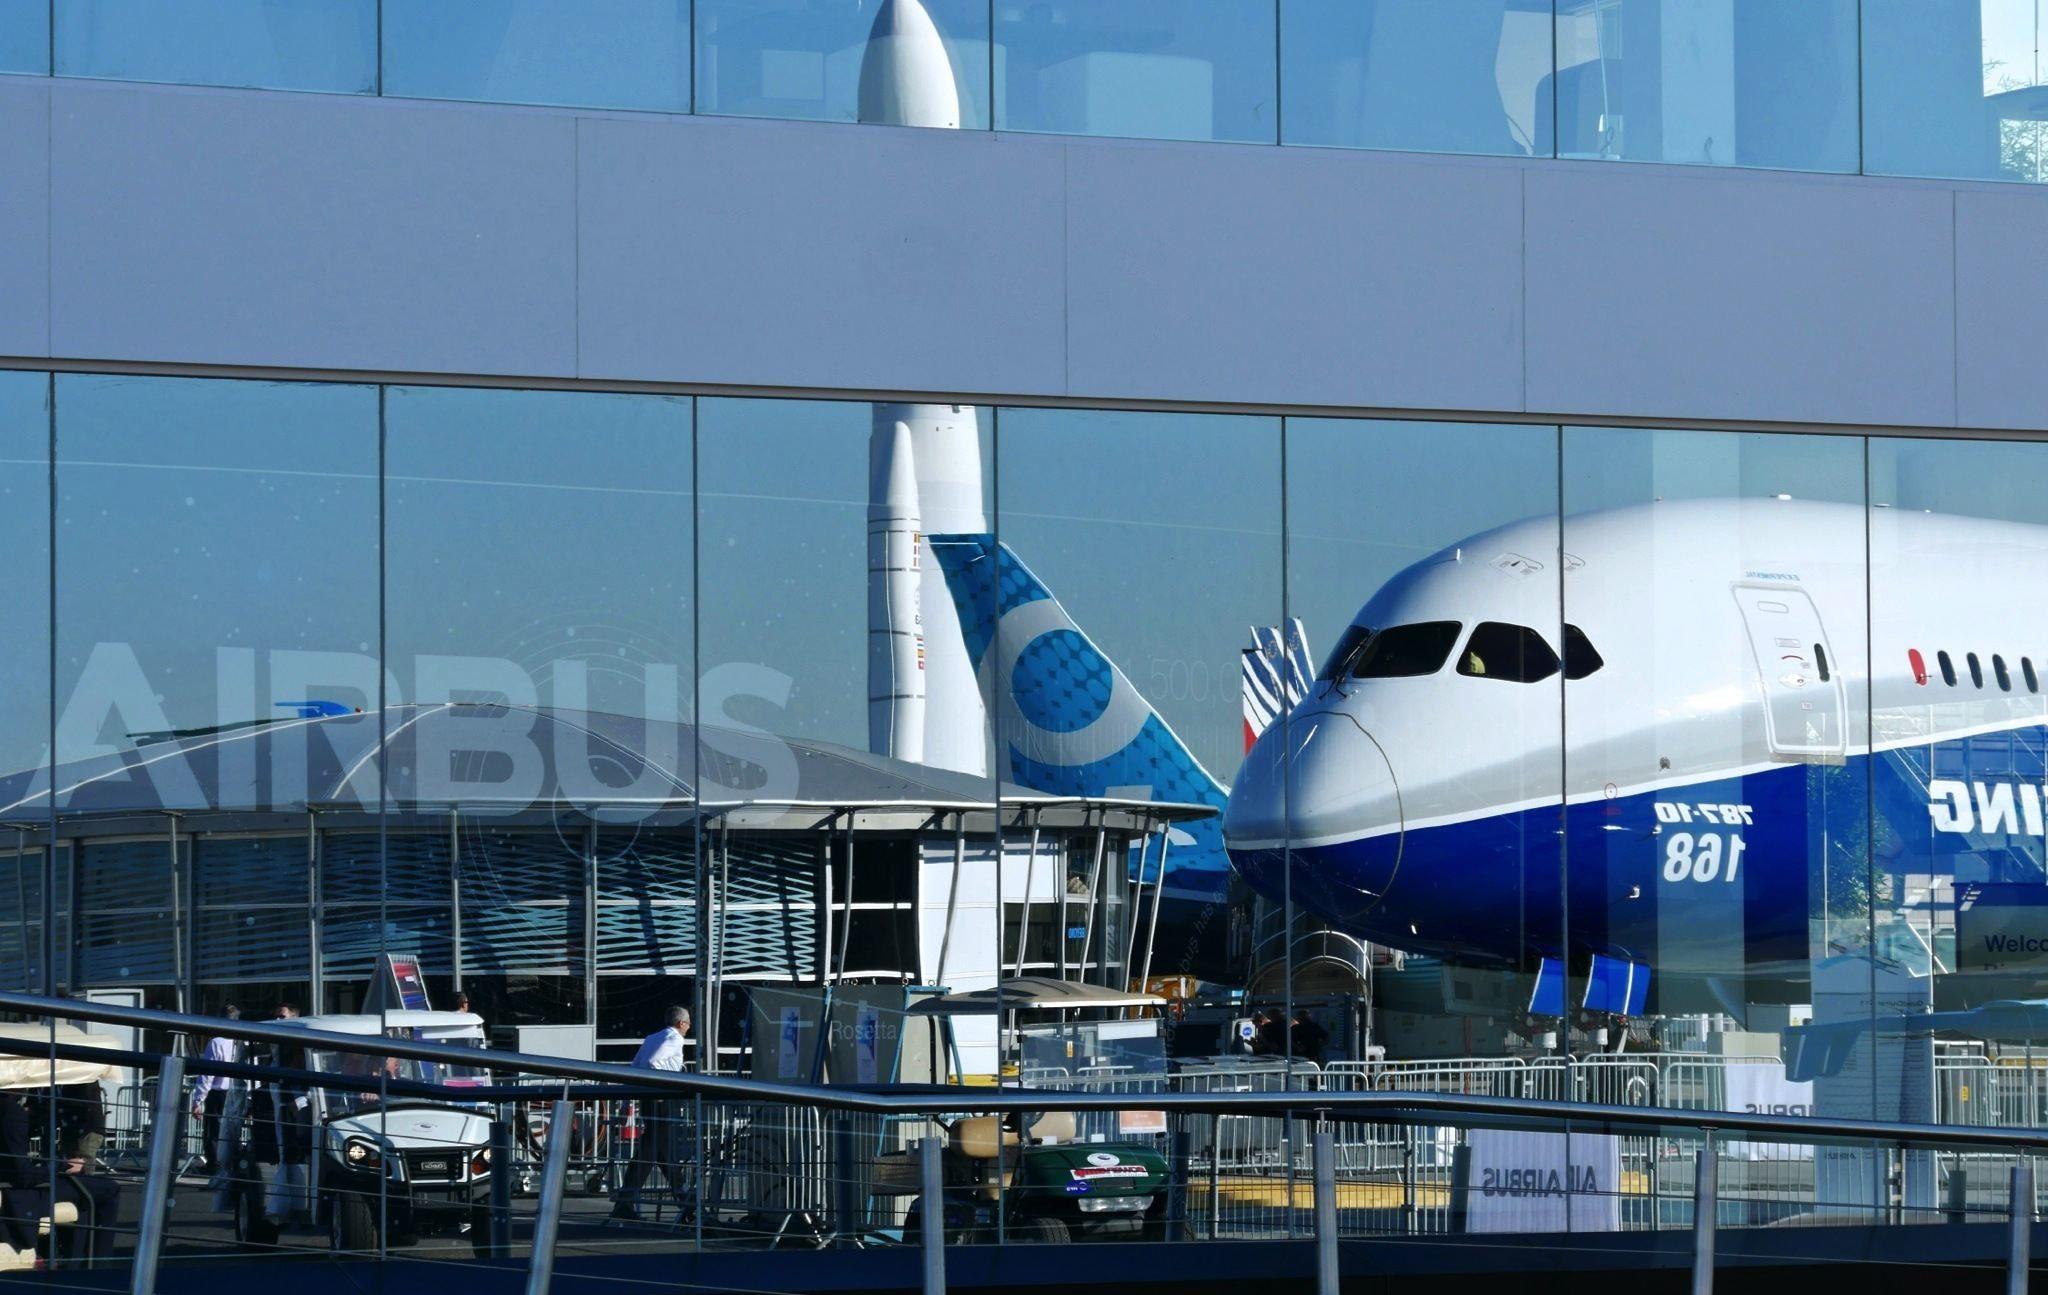 Chalet VIP Airbus et Boeing 787-100 en reflet